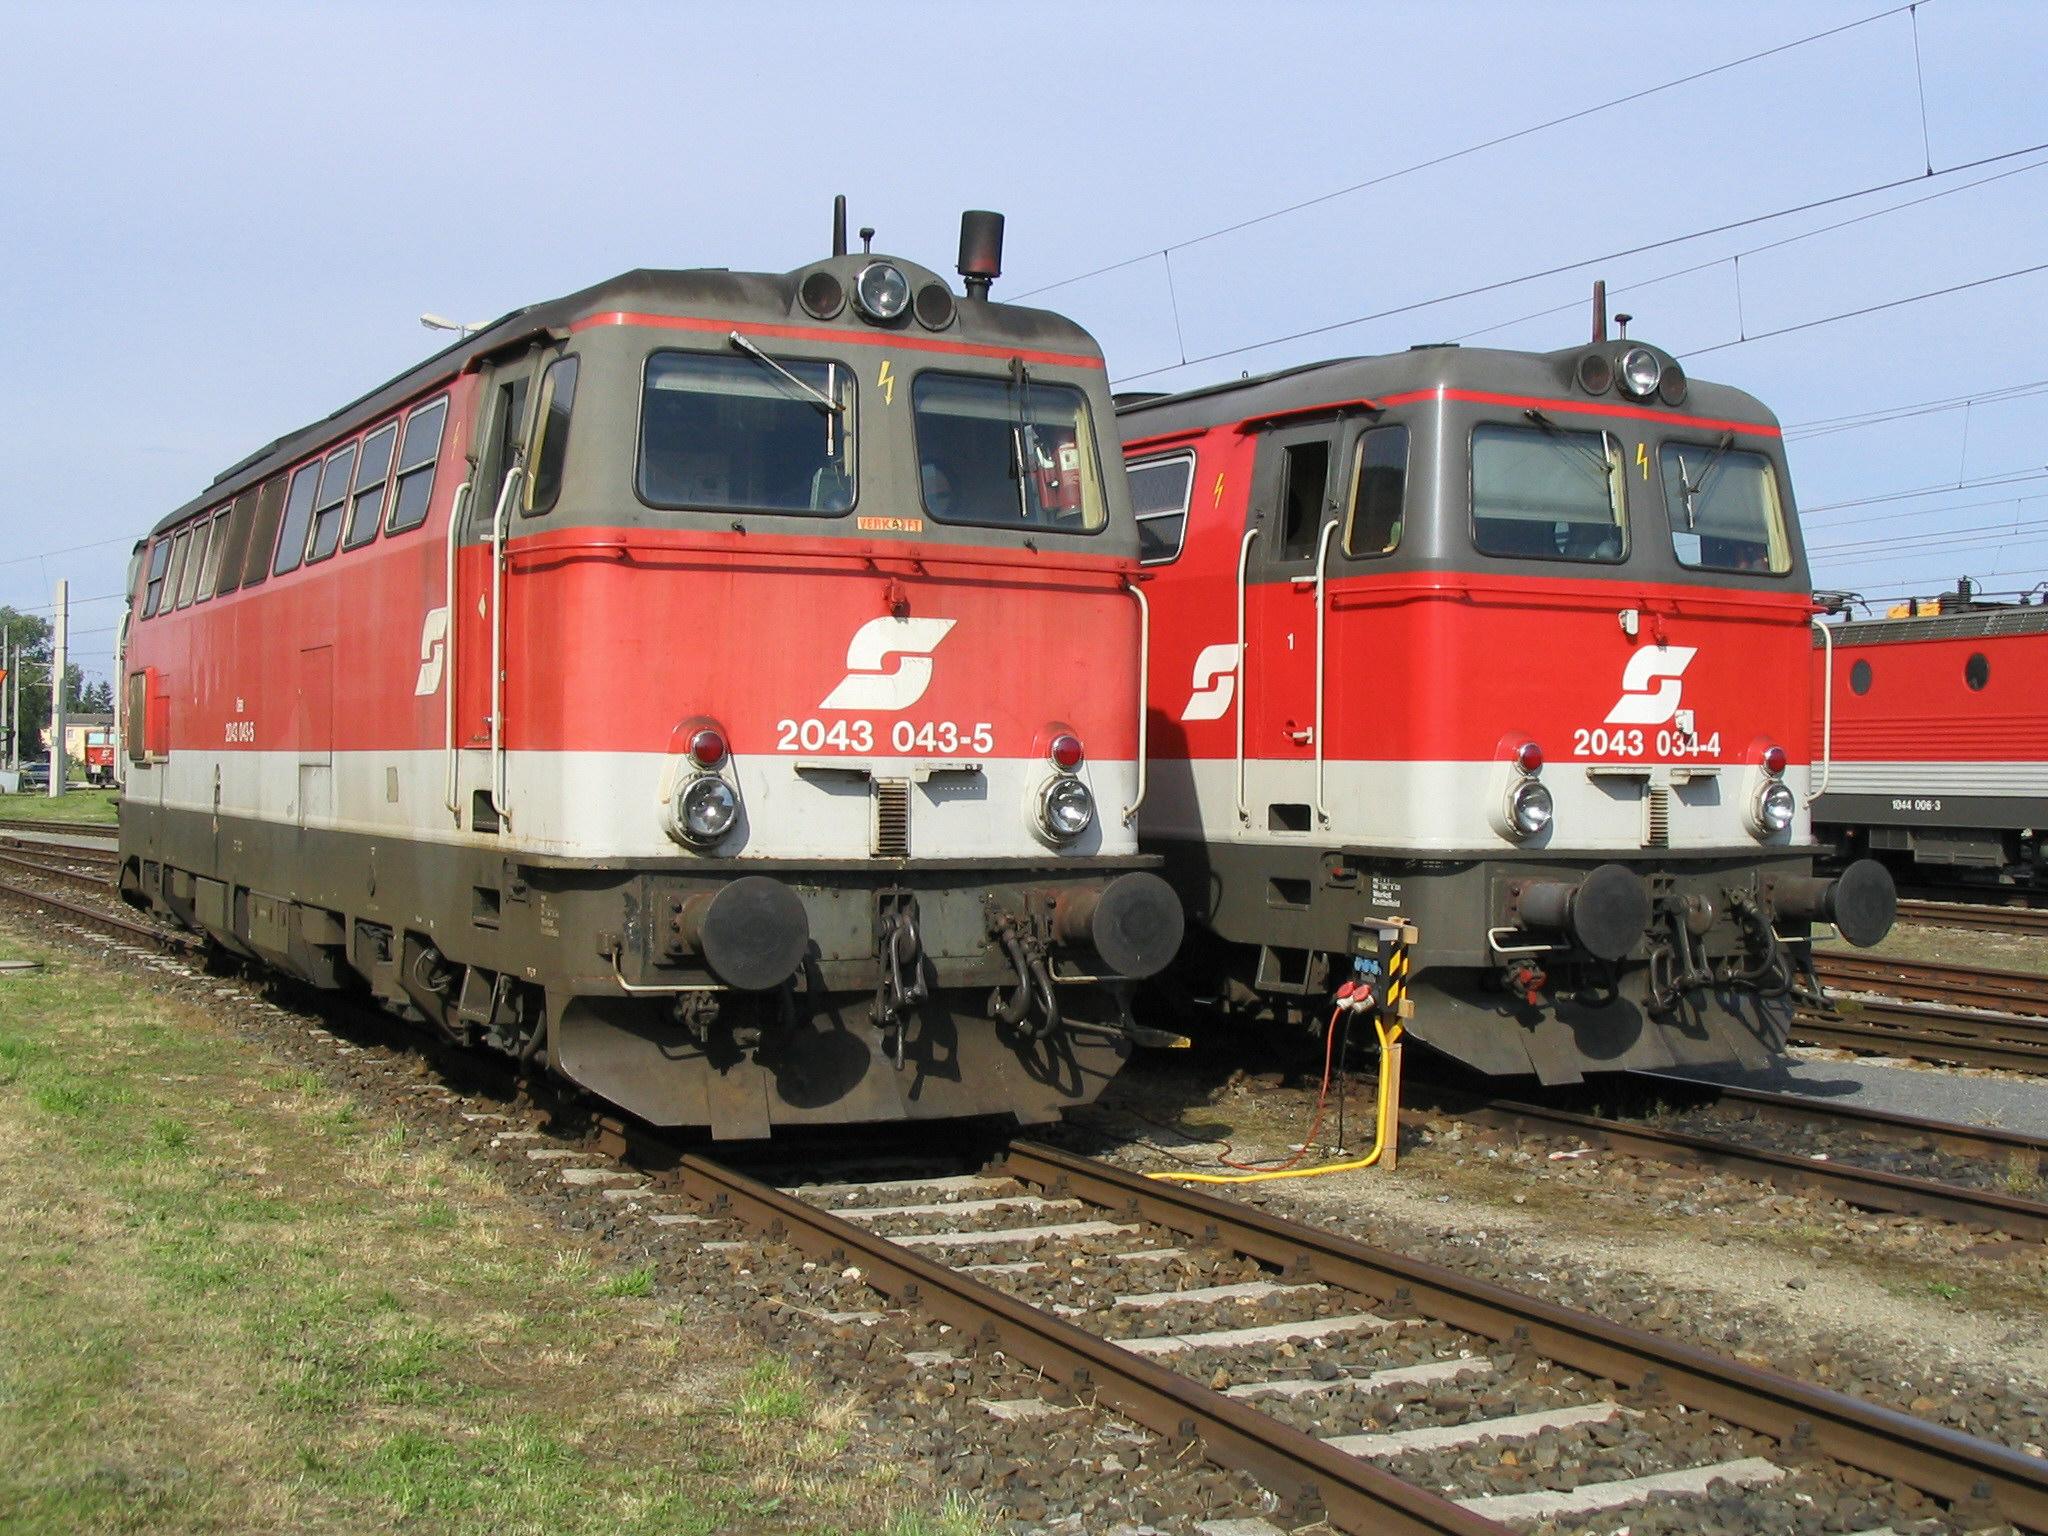 File:Br 2043-Lokomotiven in Wels.jpg